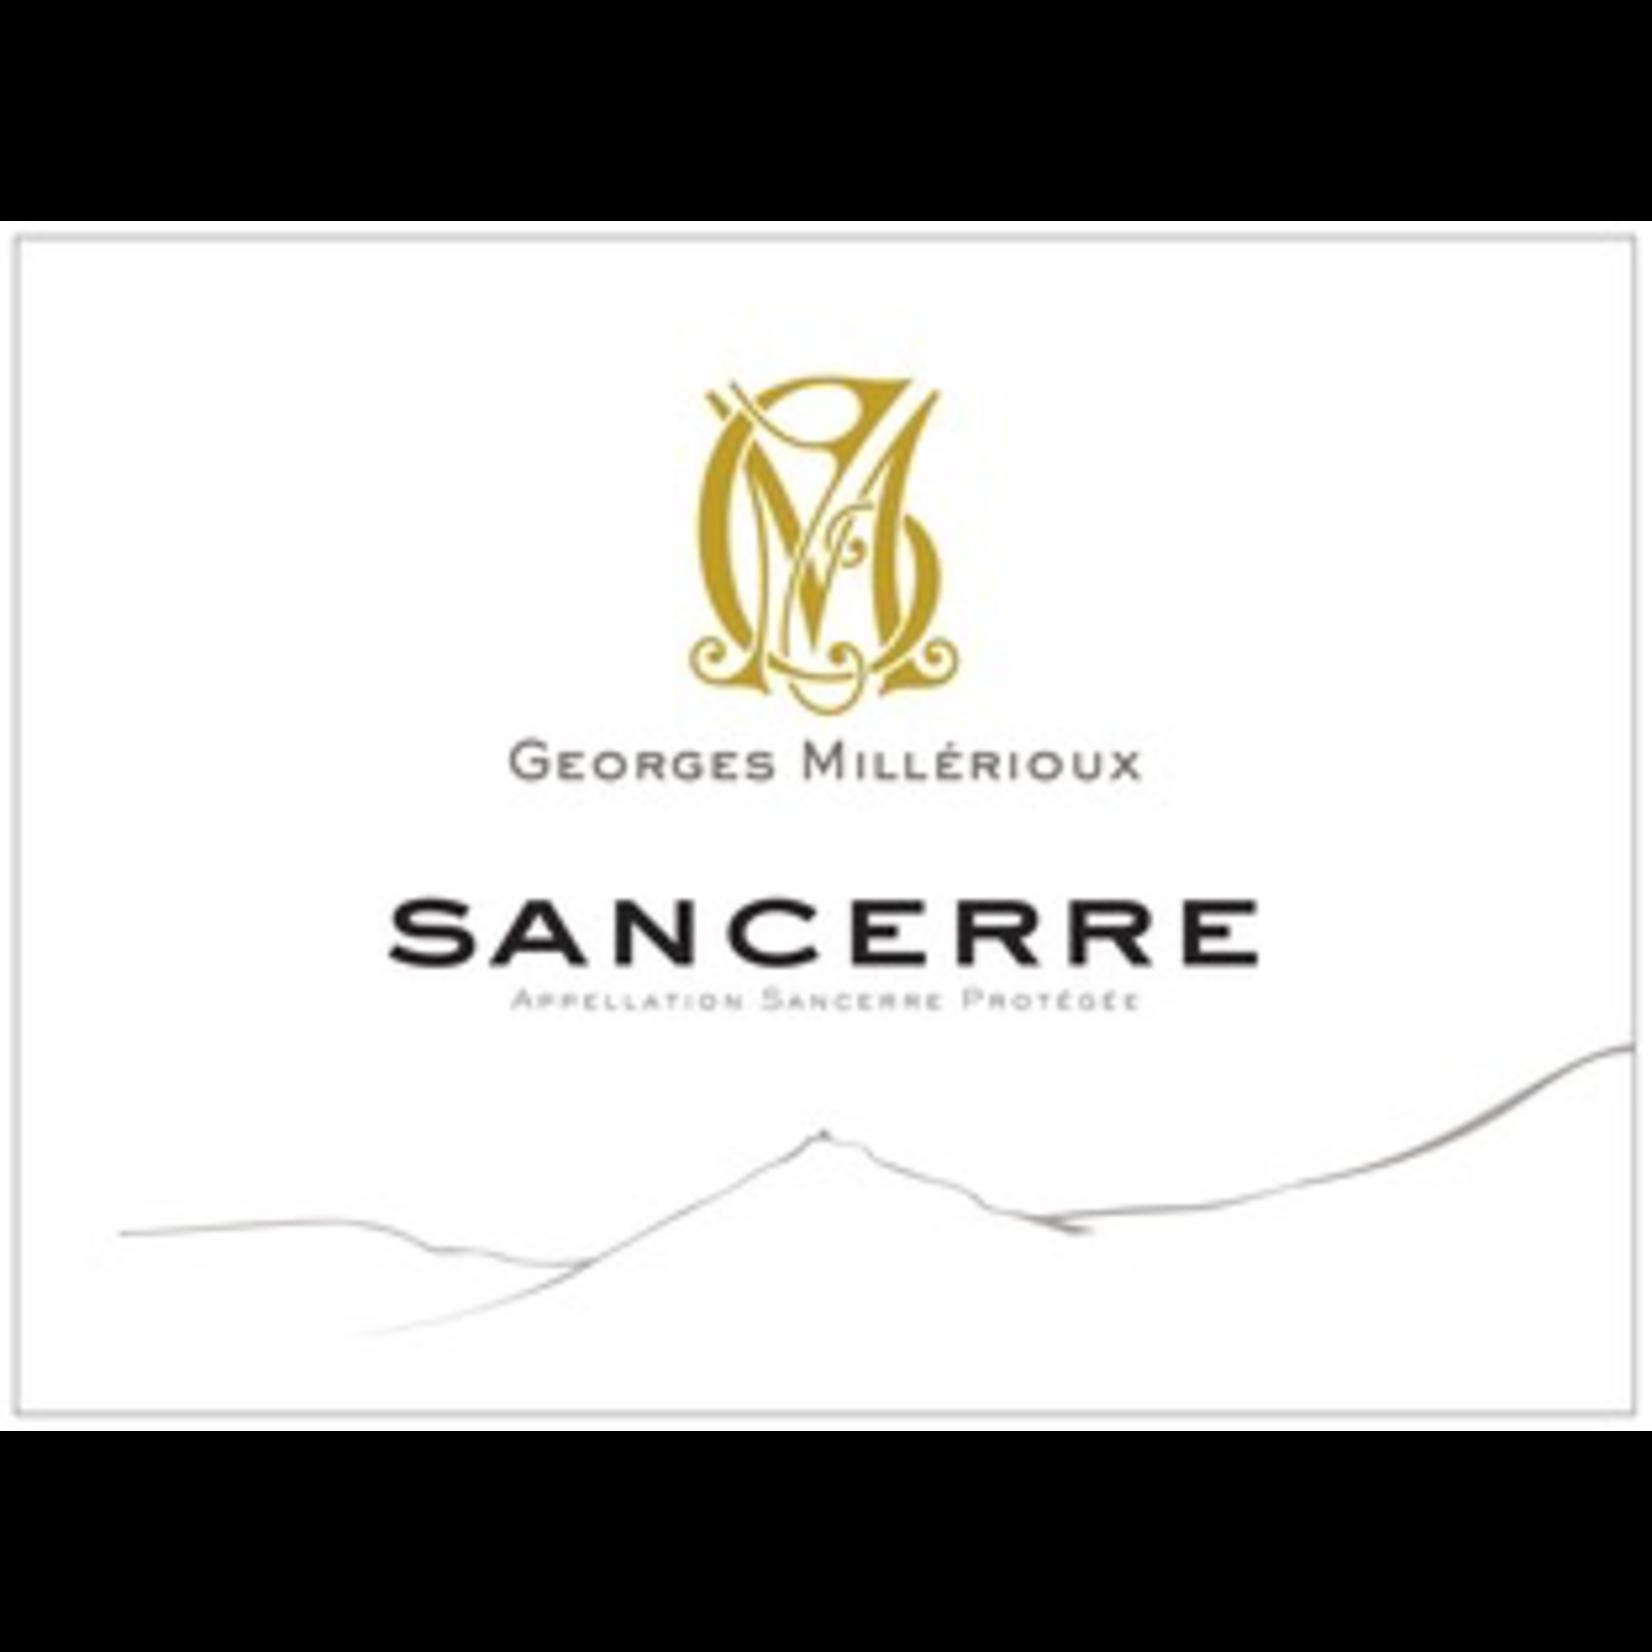 Georges Millerioux Sancerre Rouge 2018